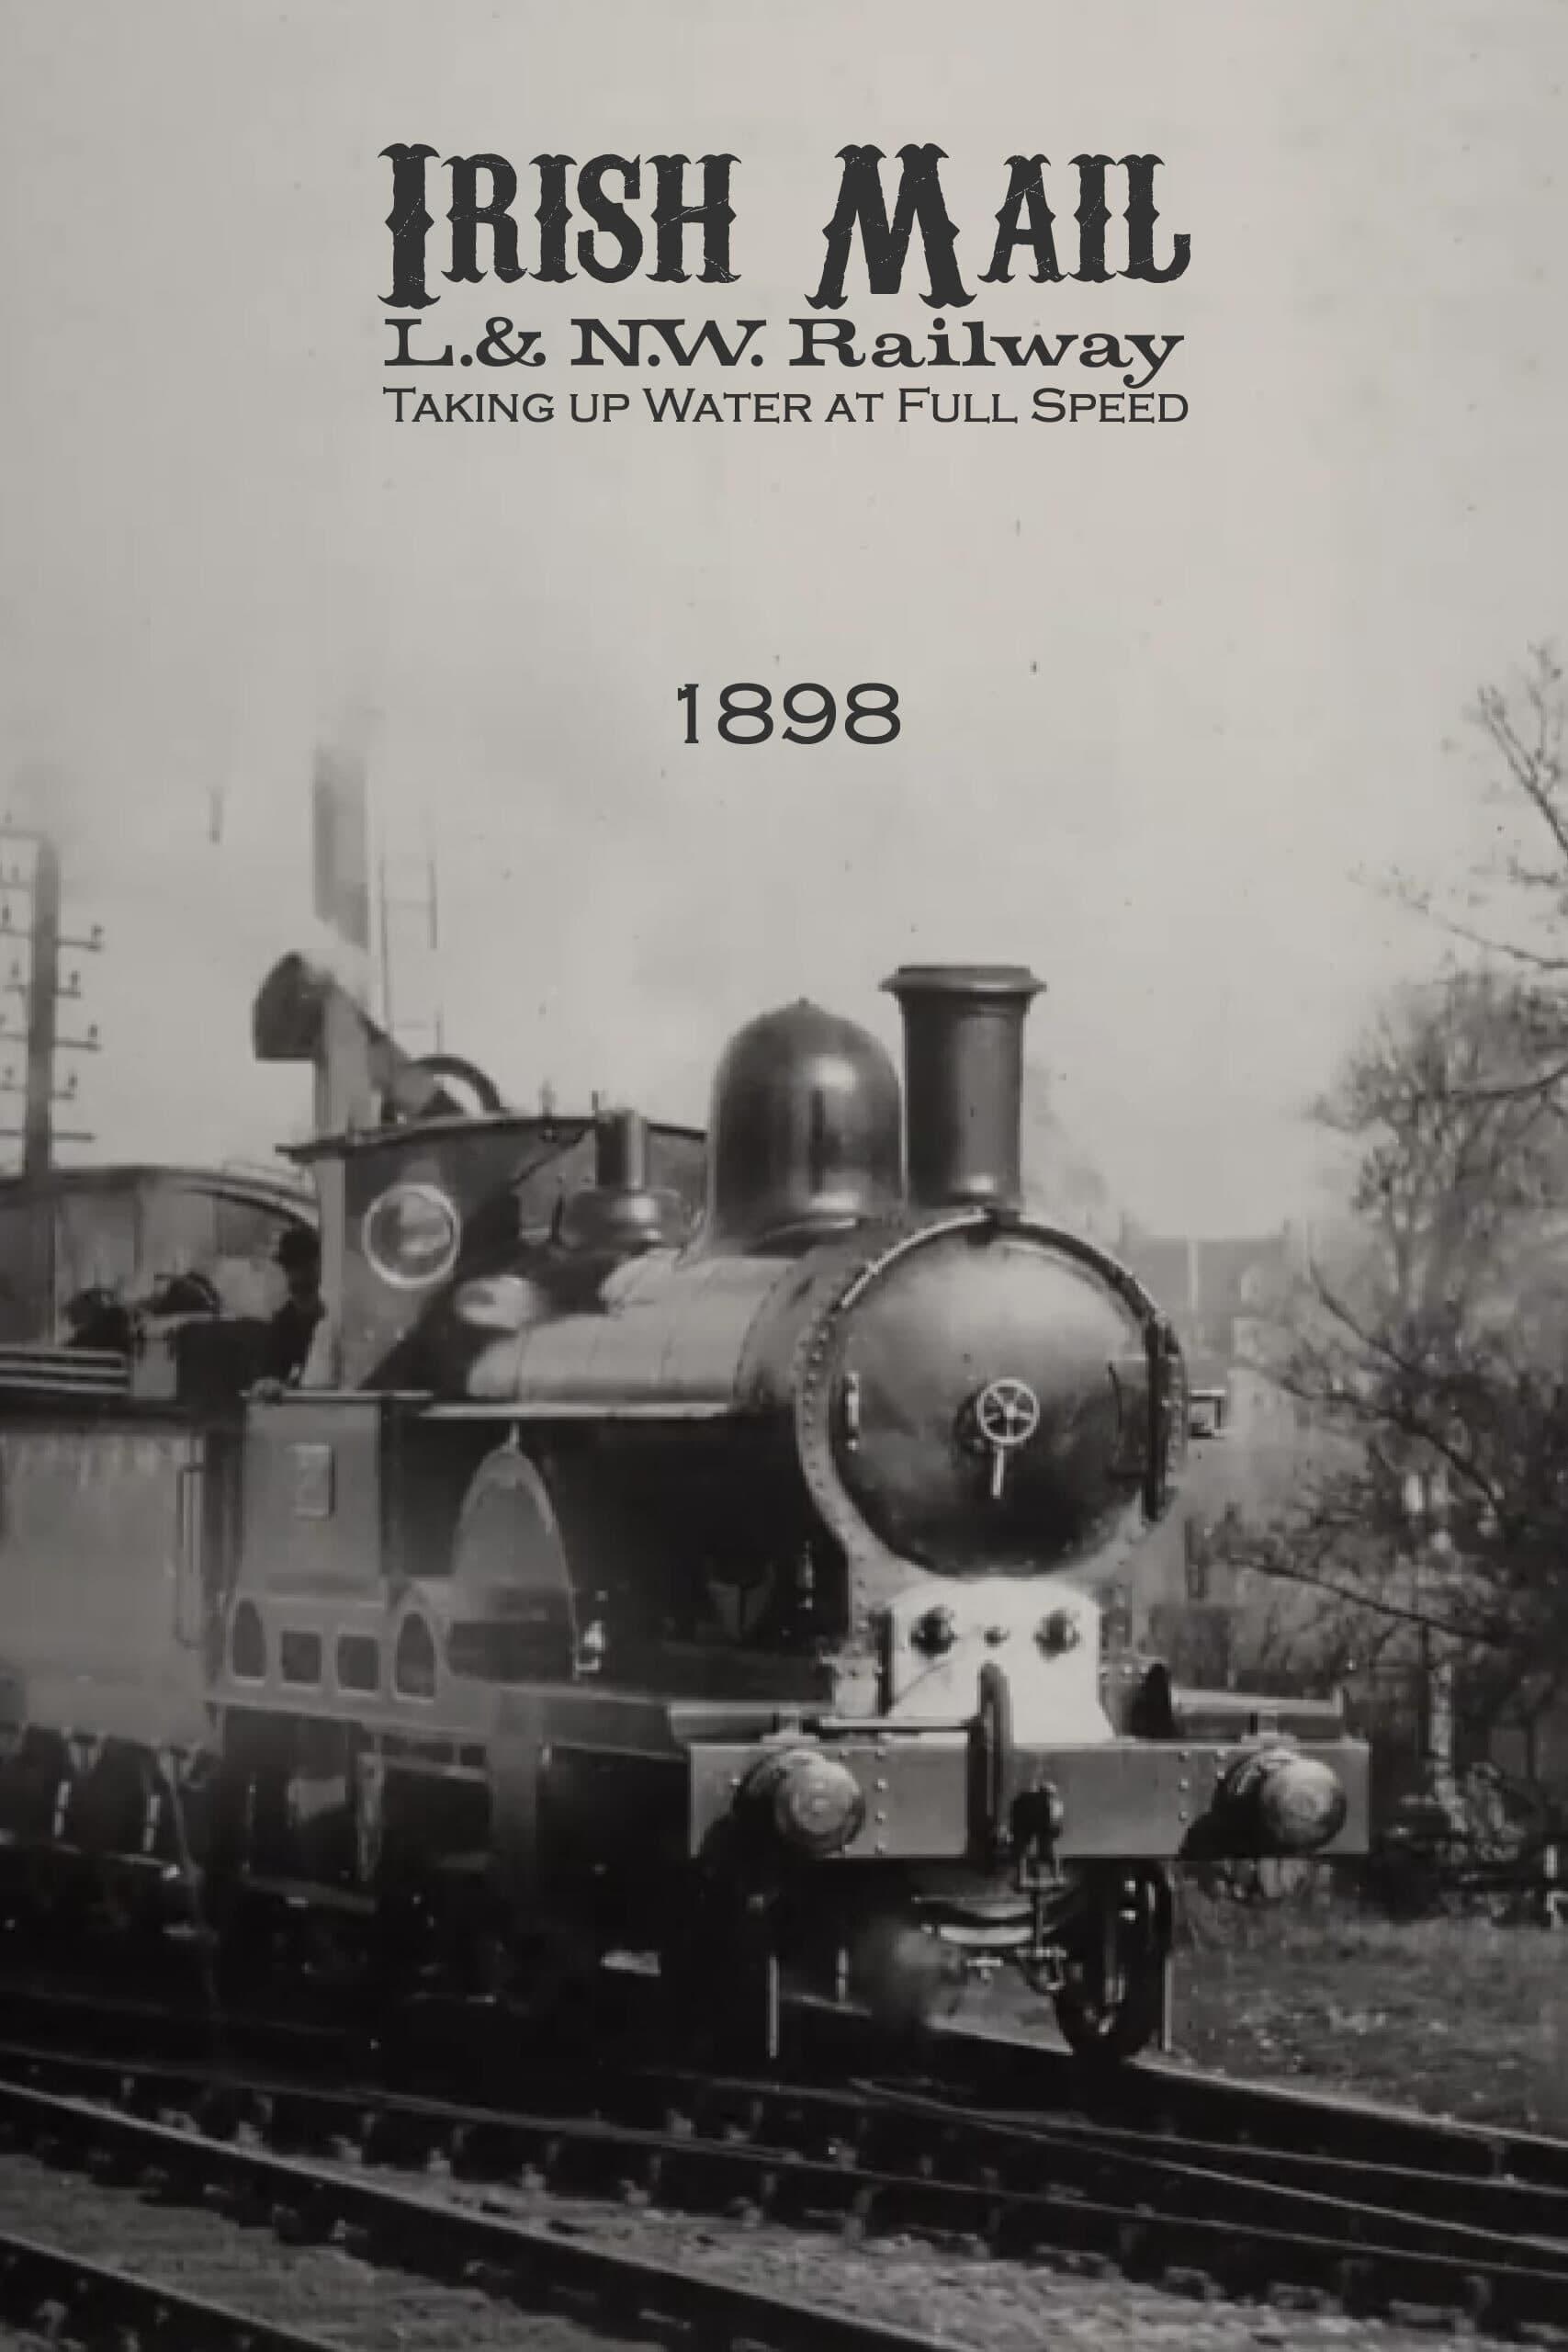 Irish Mail – L.& N.W. Railway – Taking up Water at Full Speed